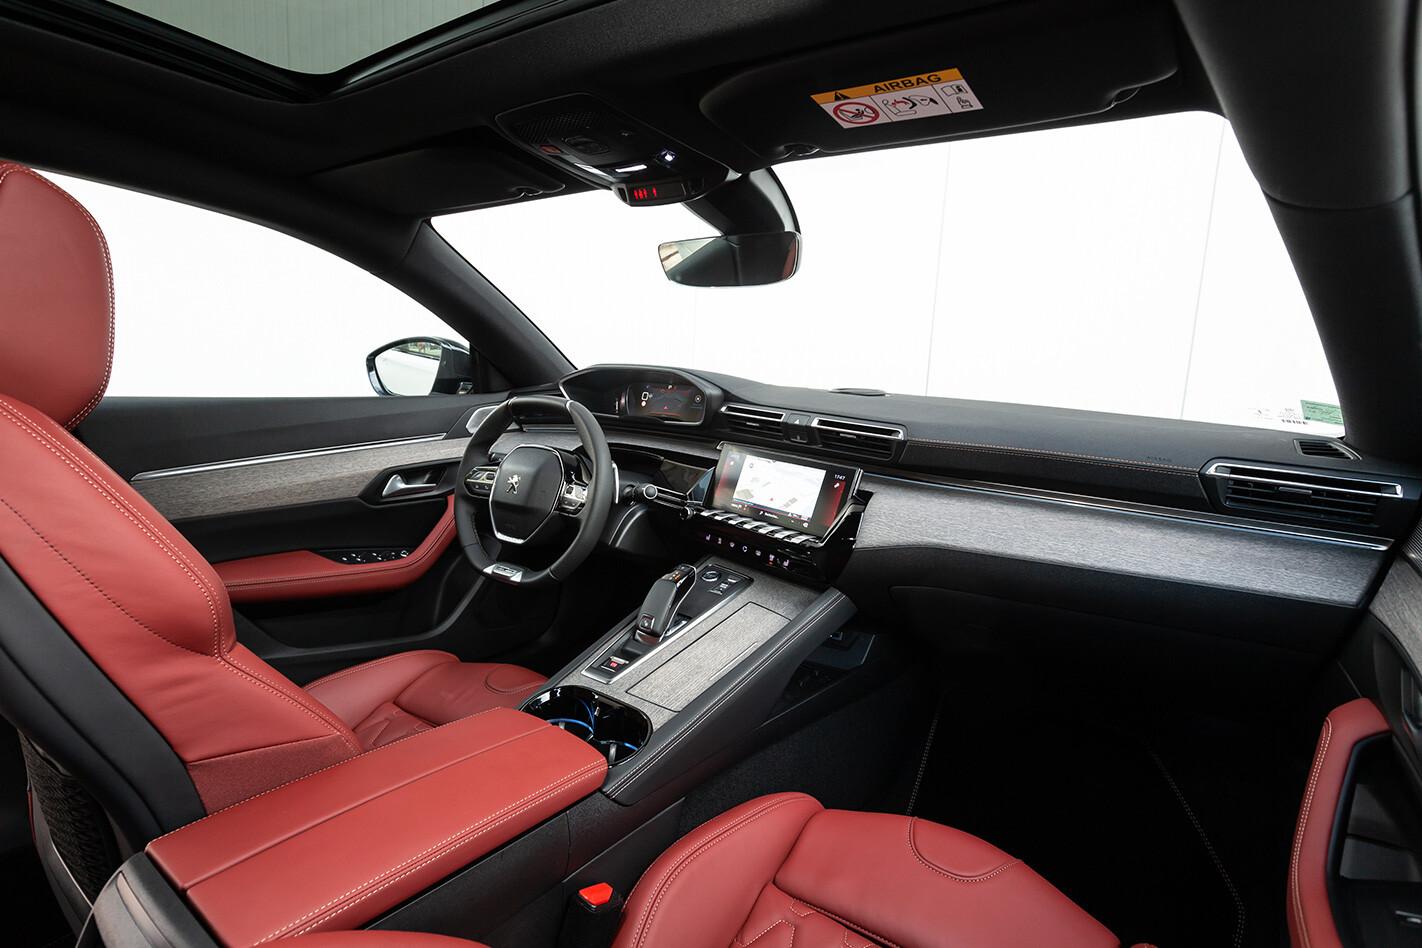 Peugeot 508 Front Seats Jpg